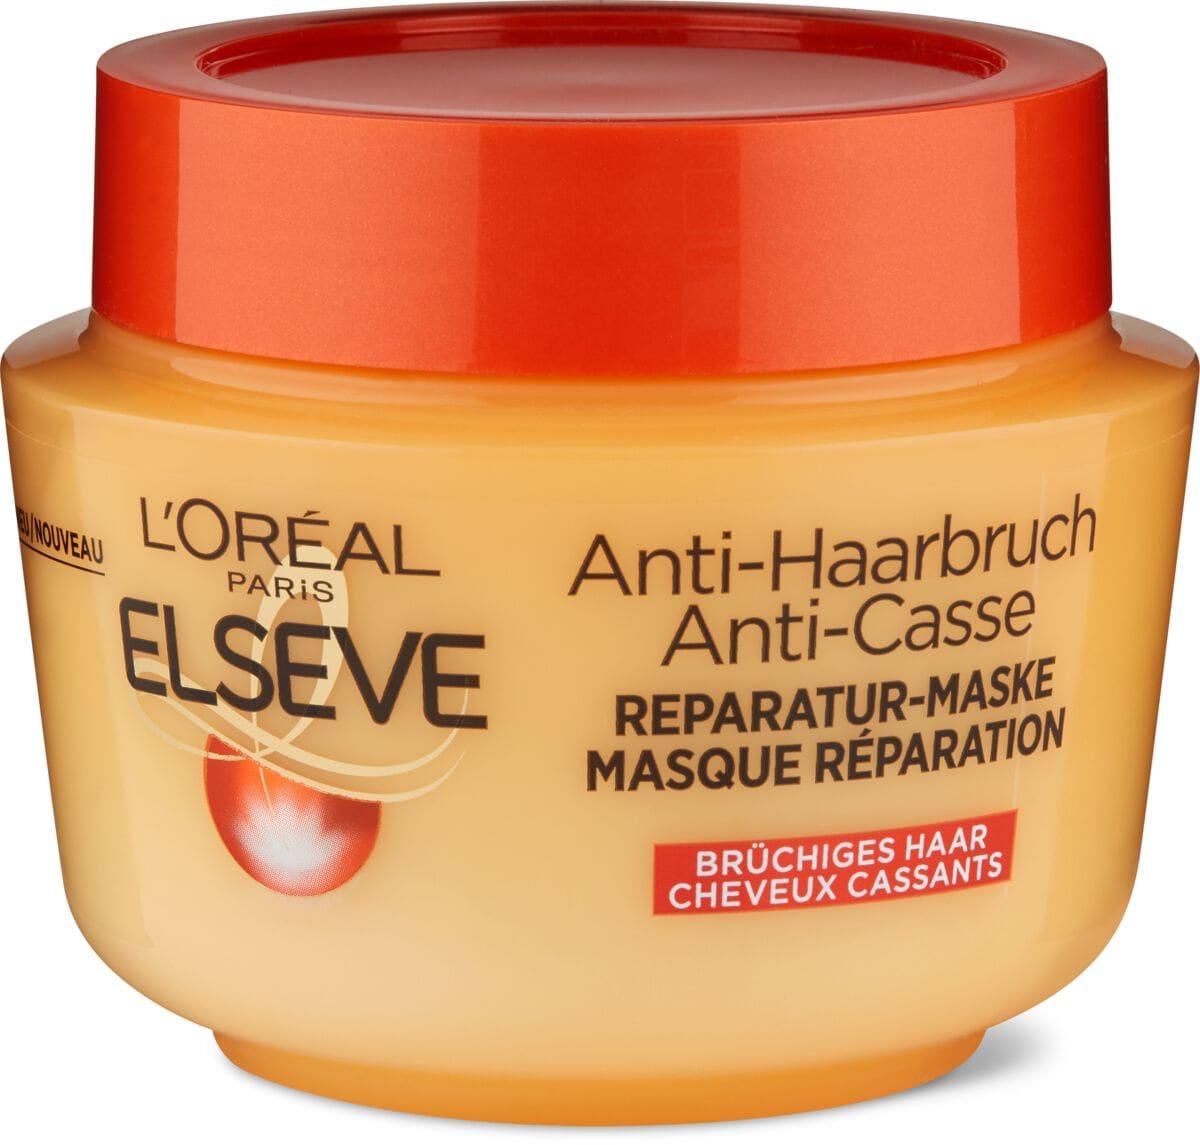 L'Oréal Elseve Maschera Anti-Rottura